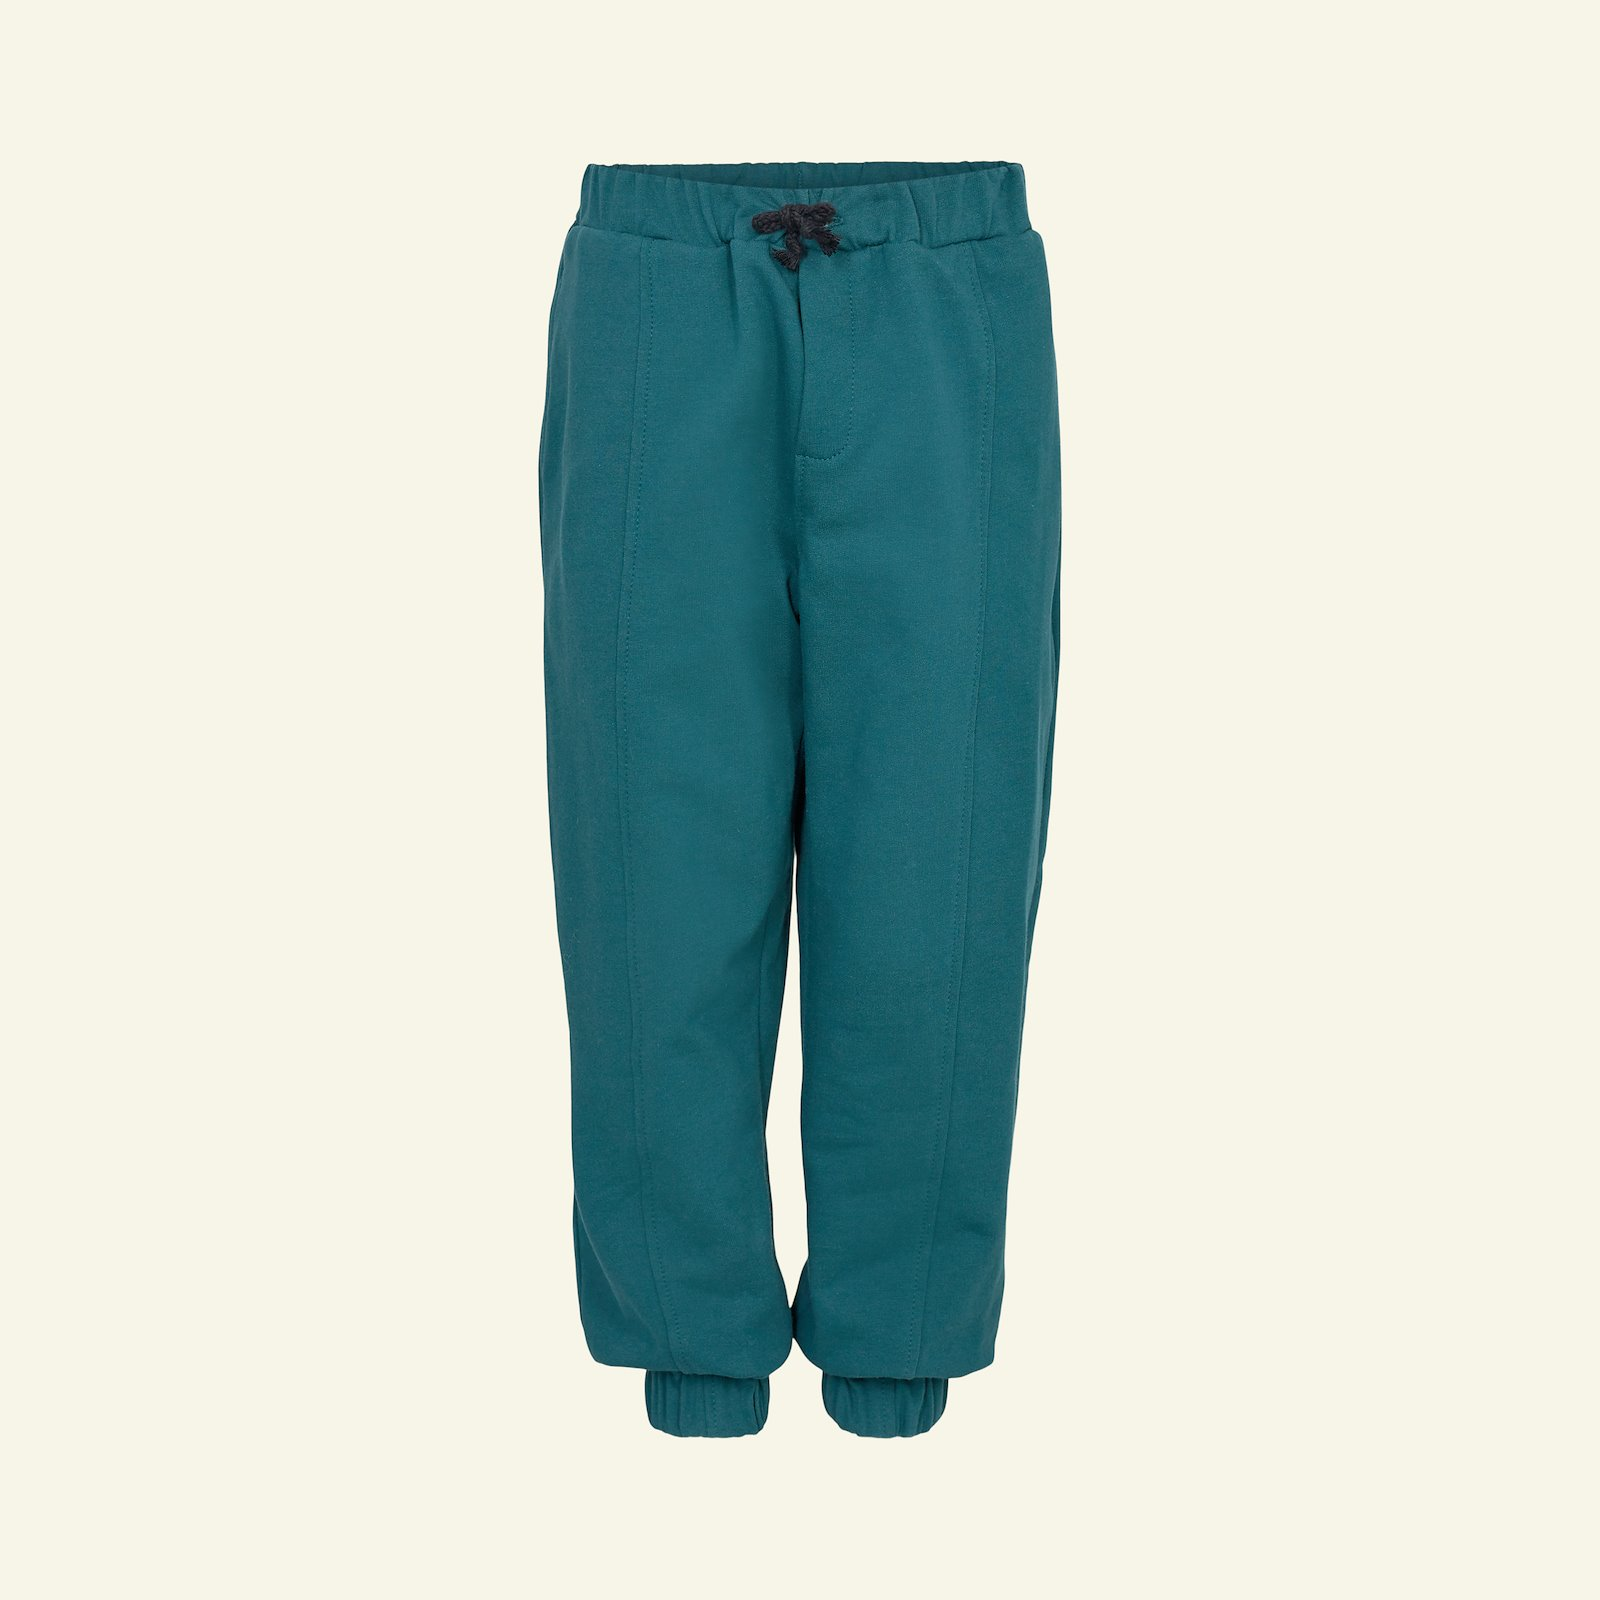 Sweatpants, 164 p60040_211775_75243_sskit